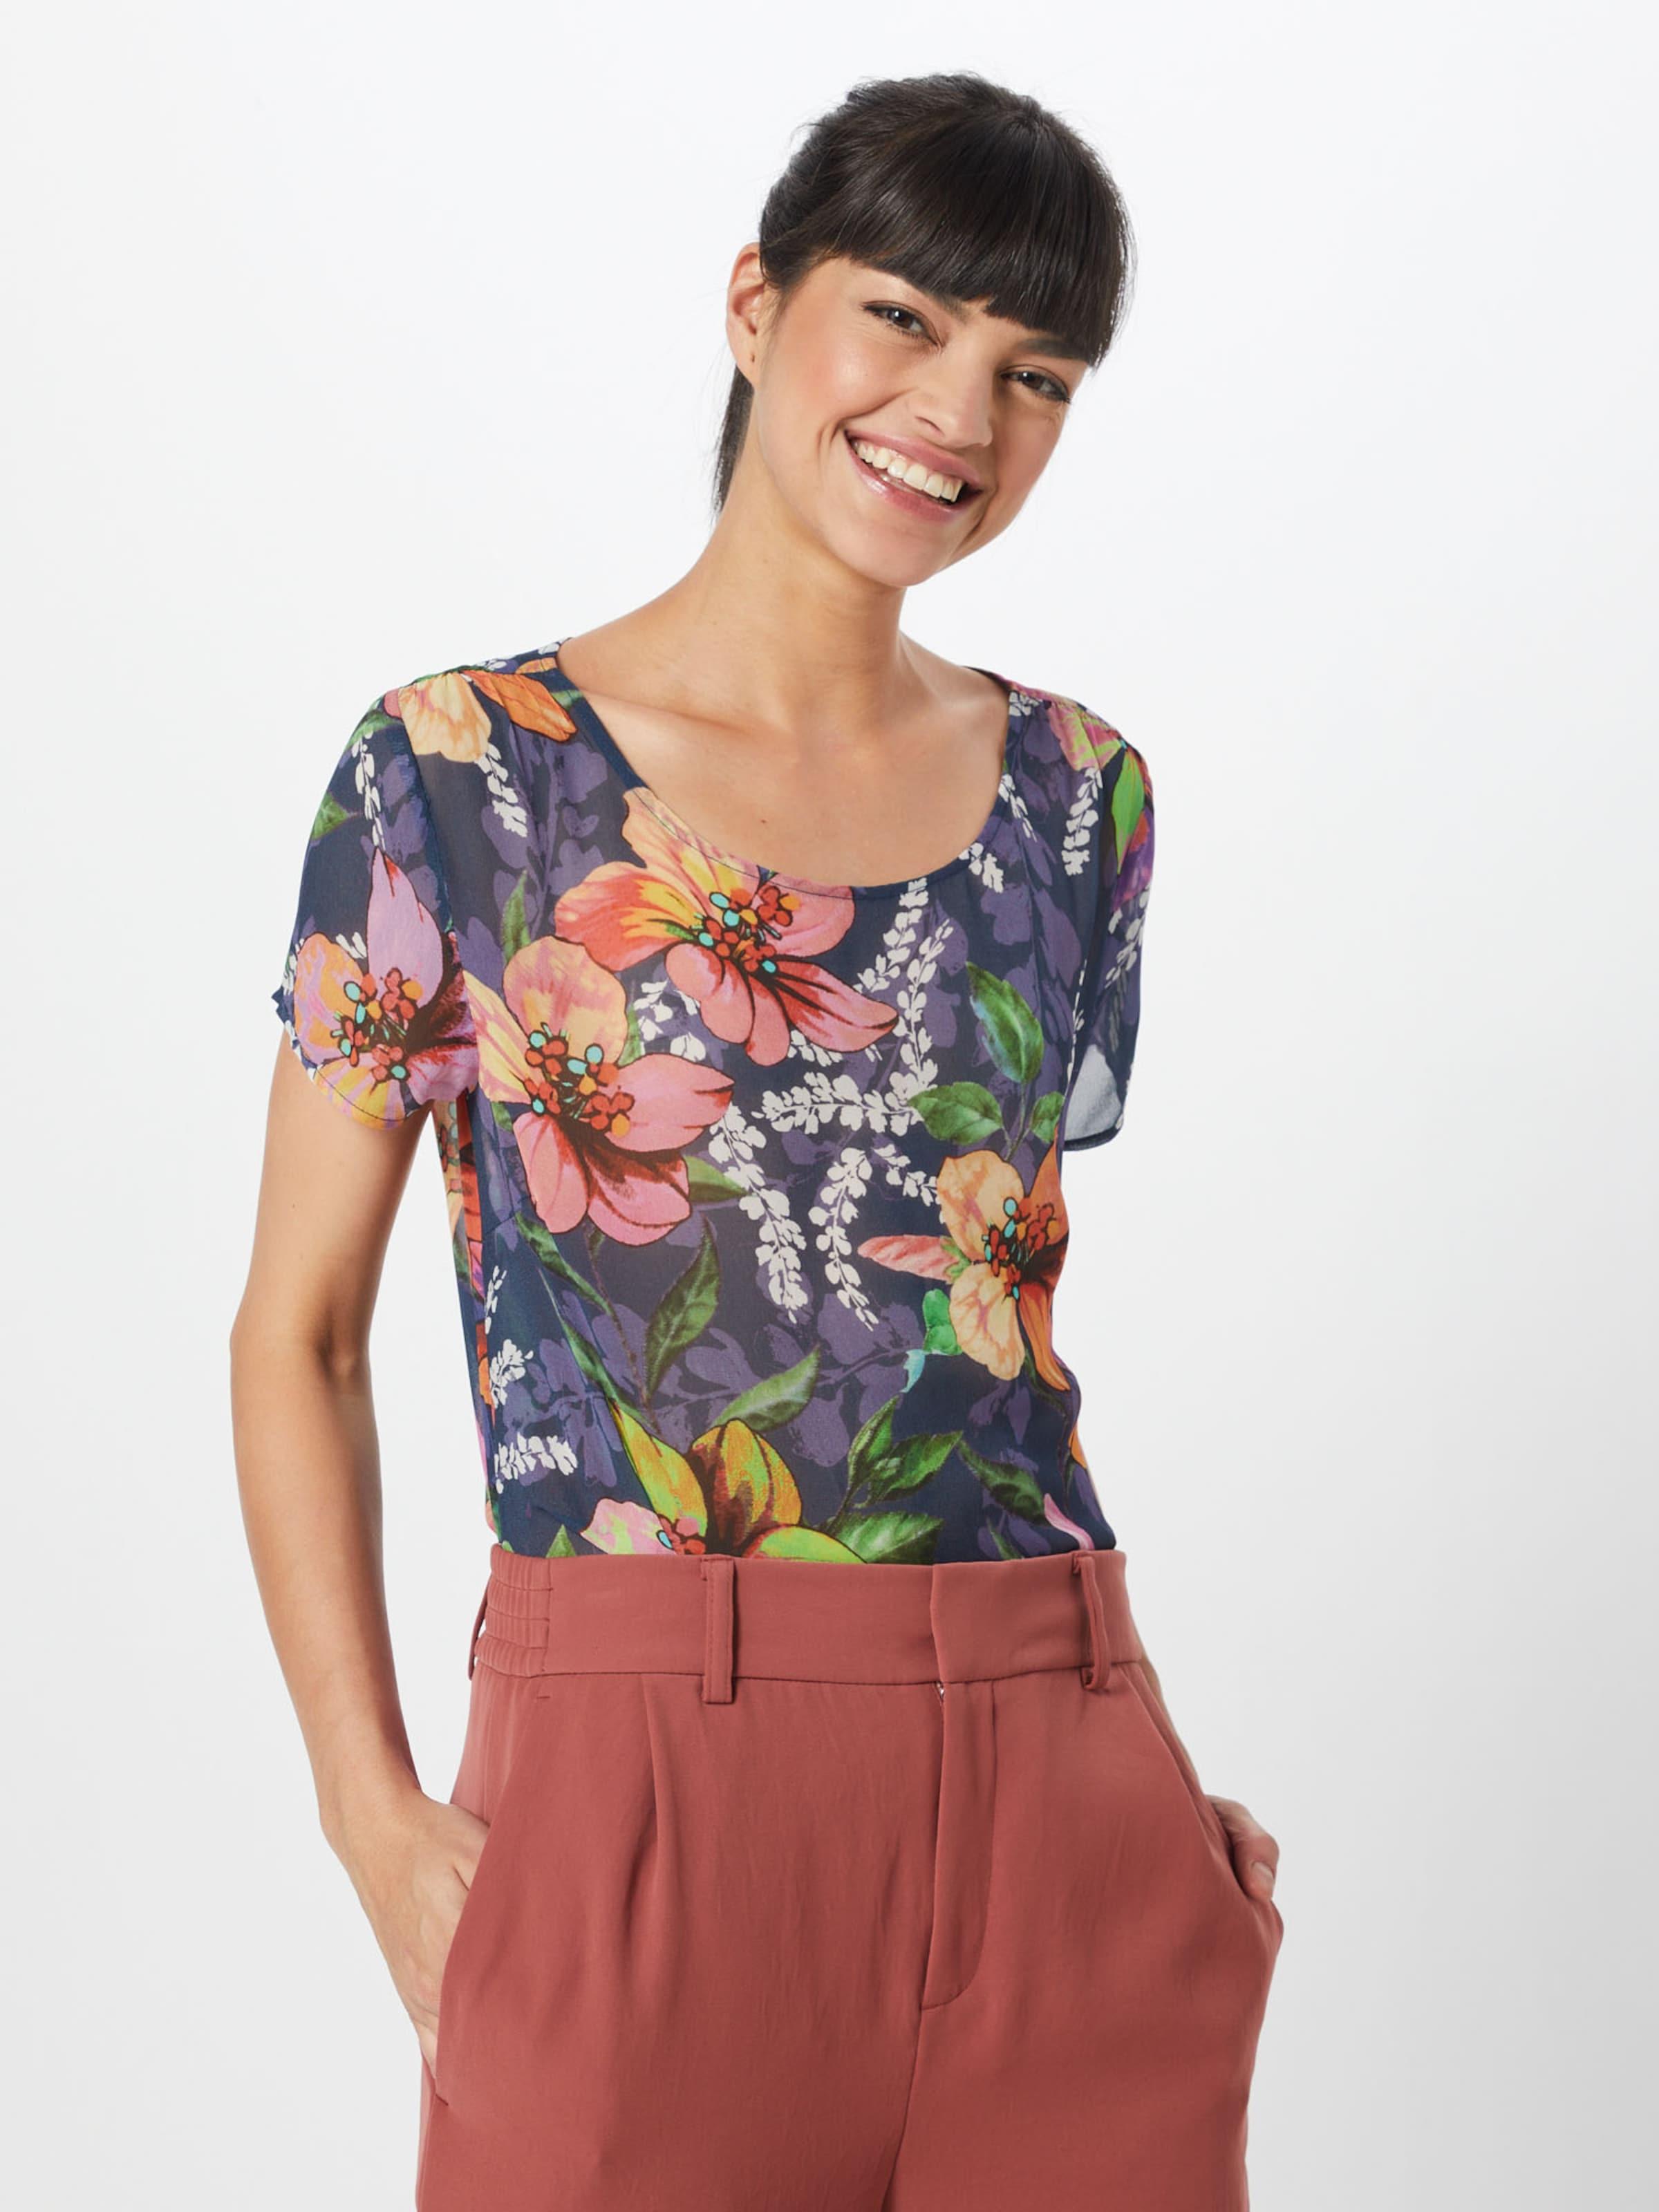 Princess In Mood' 'tropical Hollywood Goes Shirt Mischfarben TlJcK3F1